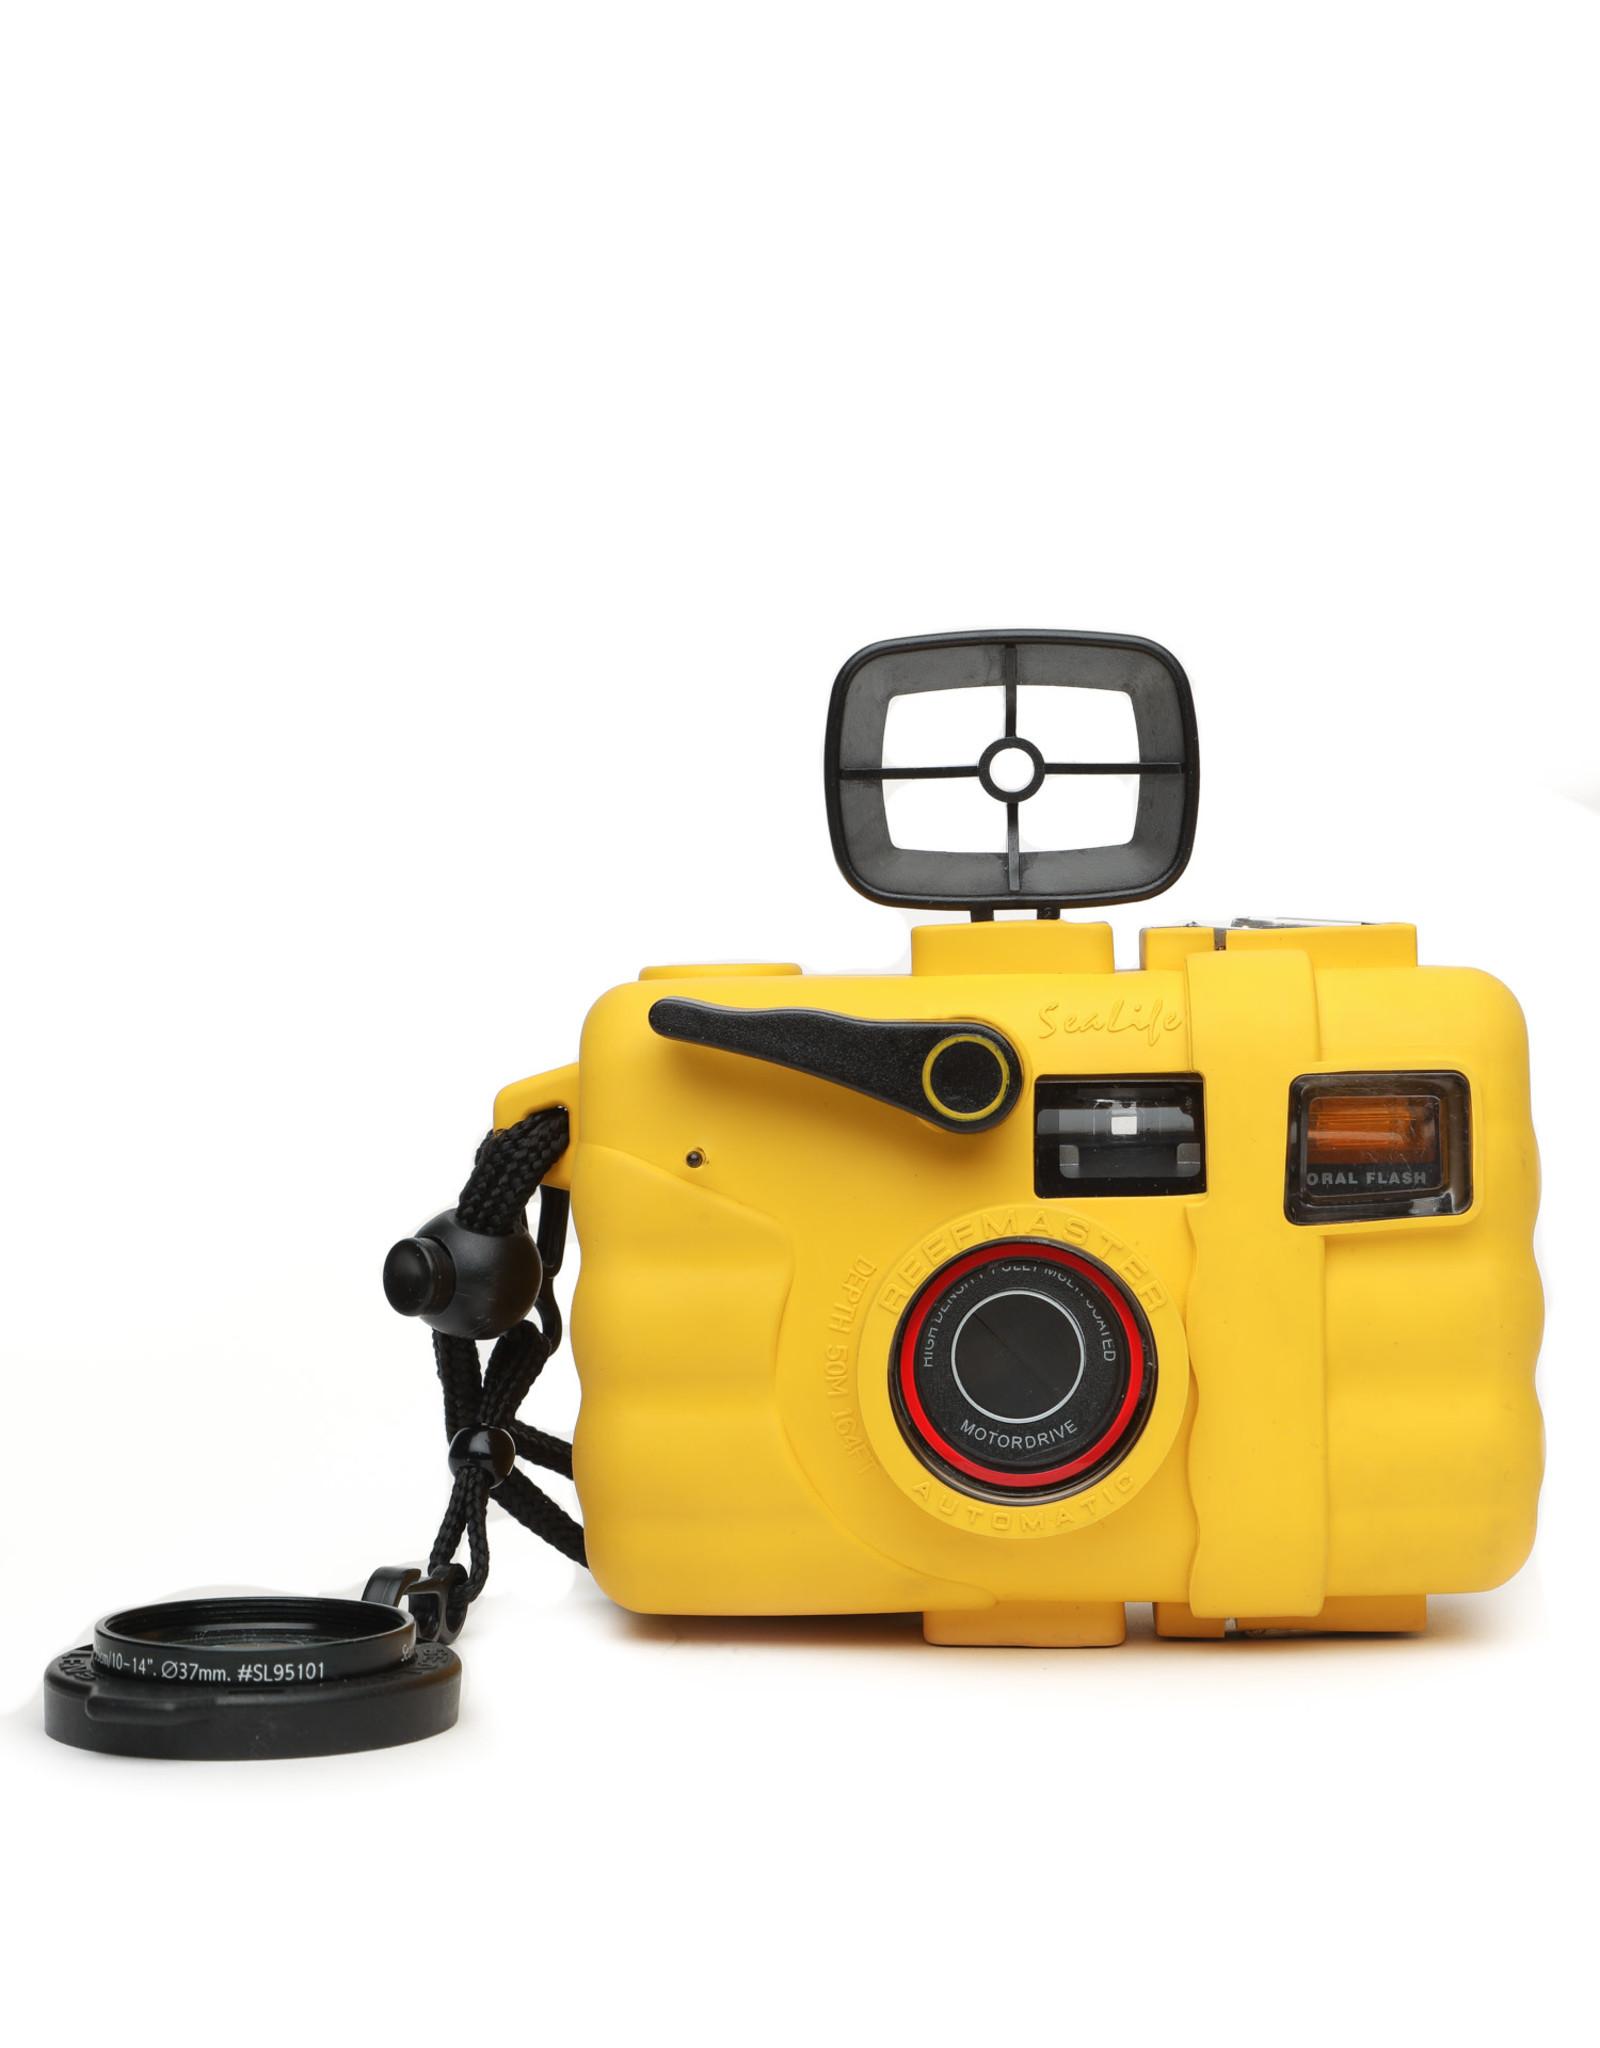 Sealife Sealife ReefMaster Underwarter 35mm Camera w/Flash